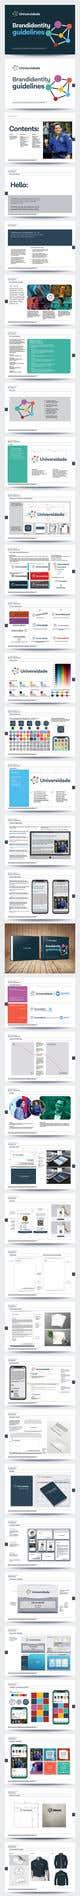 Imej kecil Penyertaan Peraduan #                                                287                                              untuk                                                 Complete Brand Book, Company Design Guideline